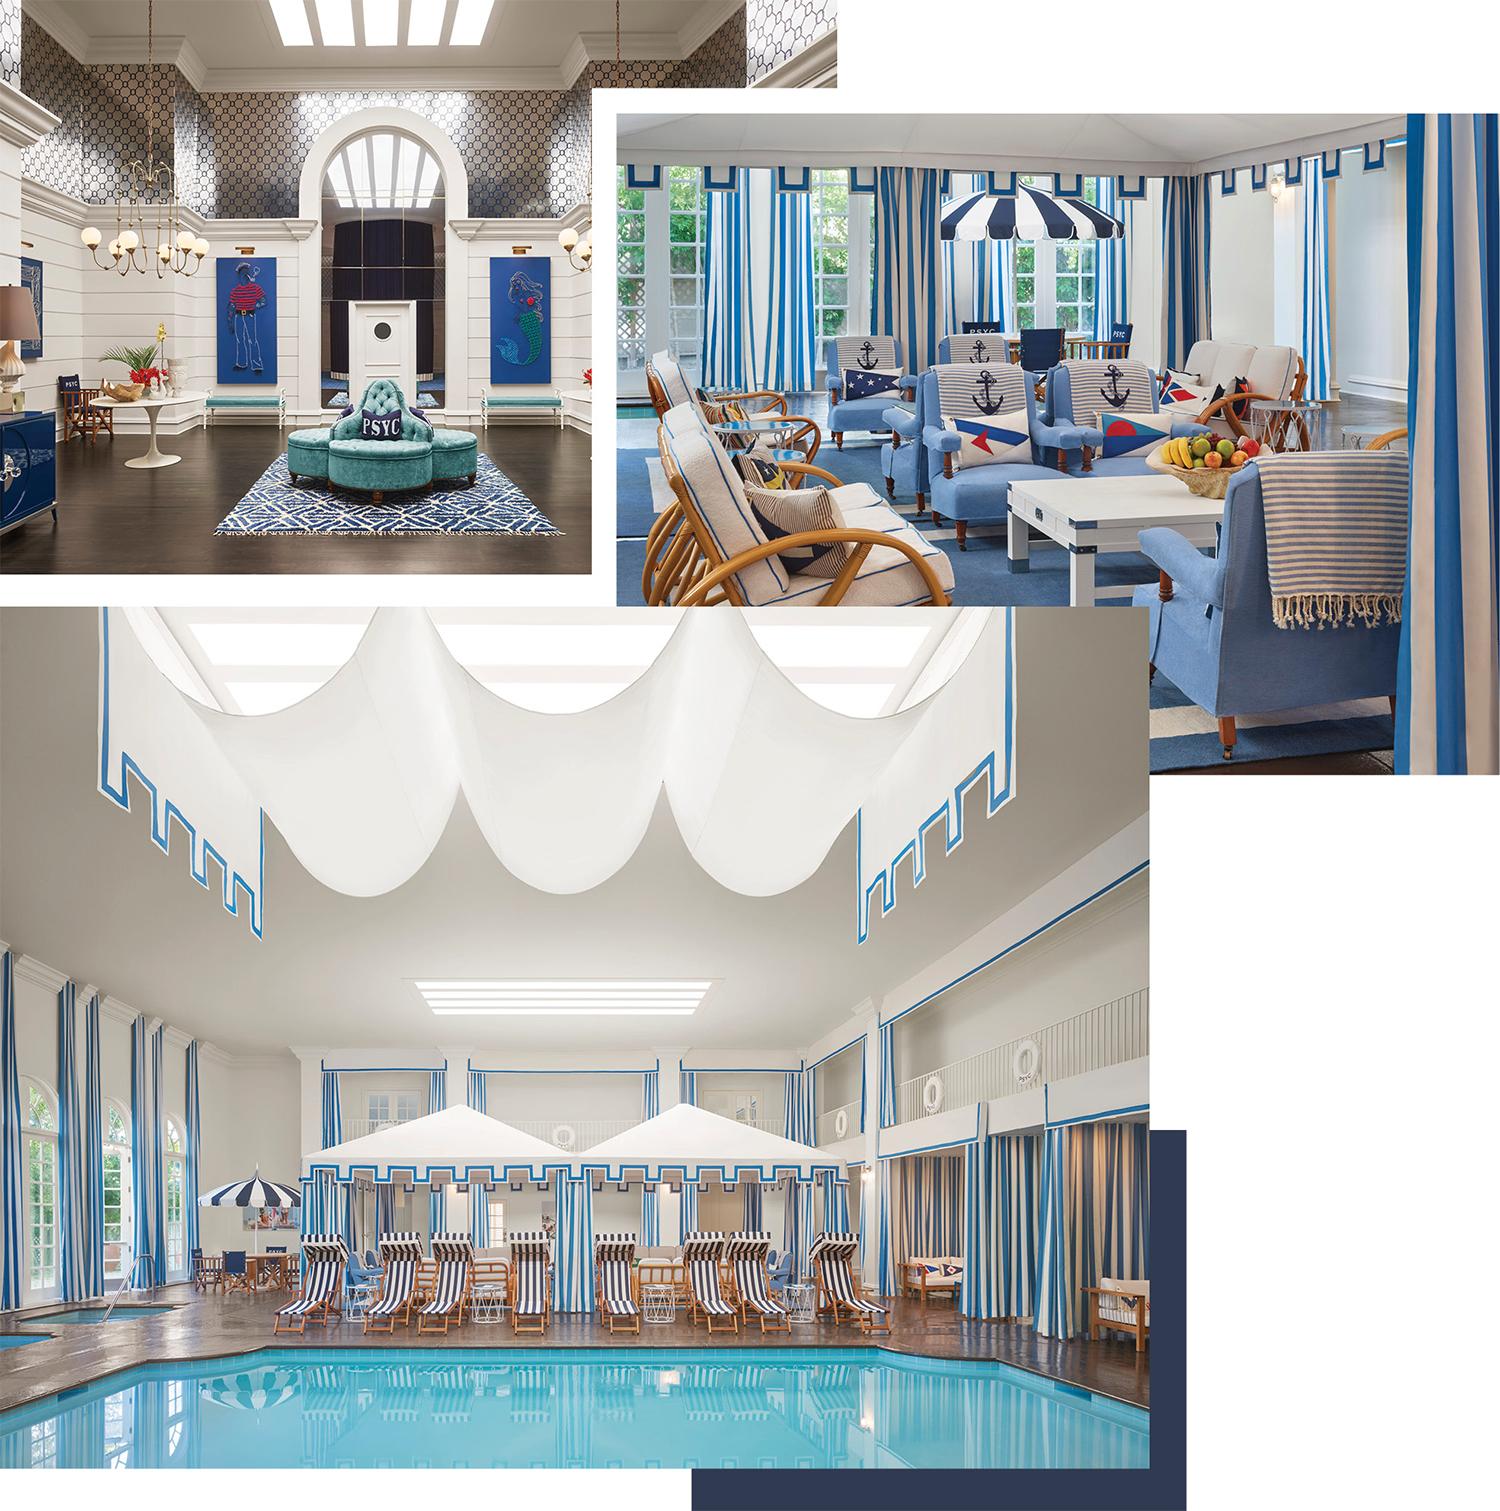 parkerpalmsprings_hotel-luxe_nautical_jonathan_adler_spa.jpg